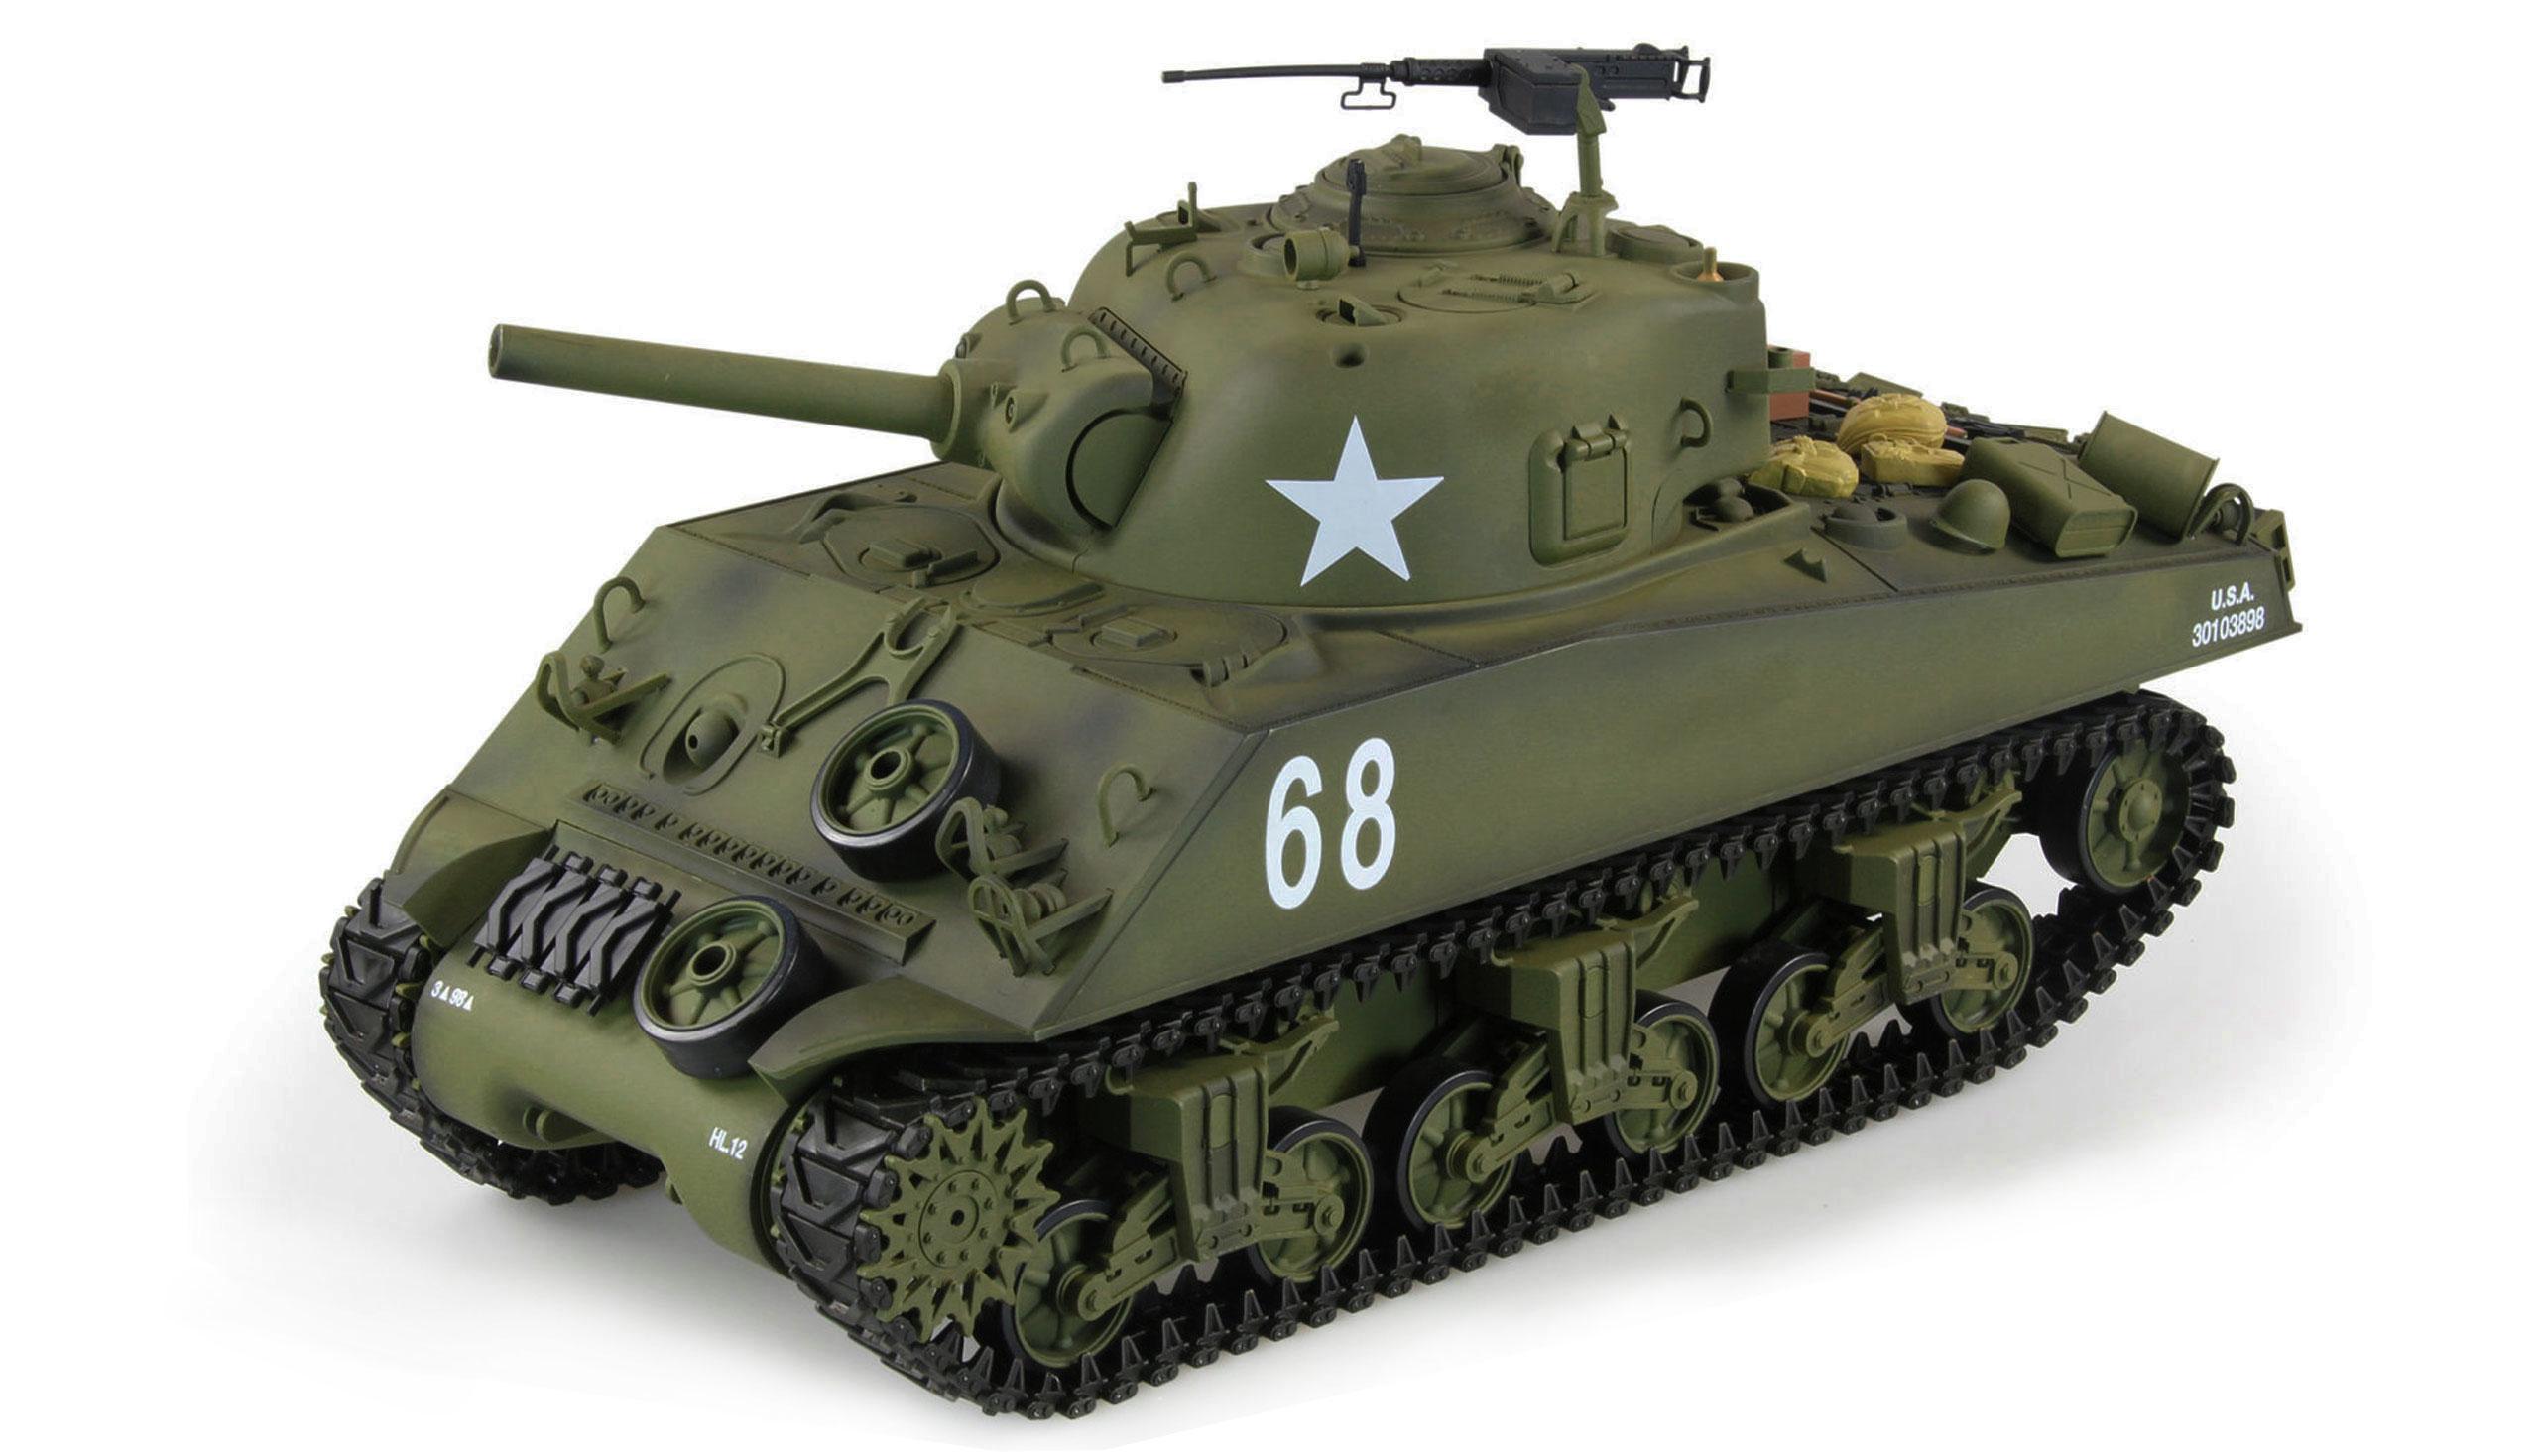 Vorschau: Amewi U.S. M4A3 Sherman - Funkgesteuerter (RC) Panzer - Elektromotor - 1:16 - Betriebsbereit (RTR) - Junge - 14 Jahr(e)